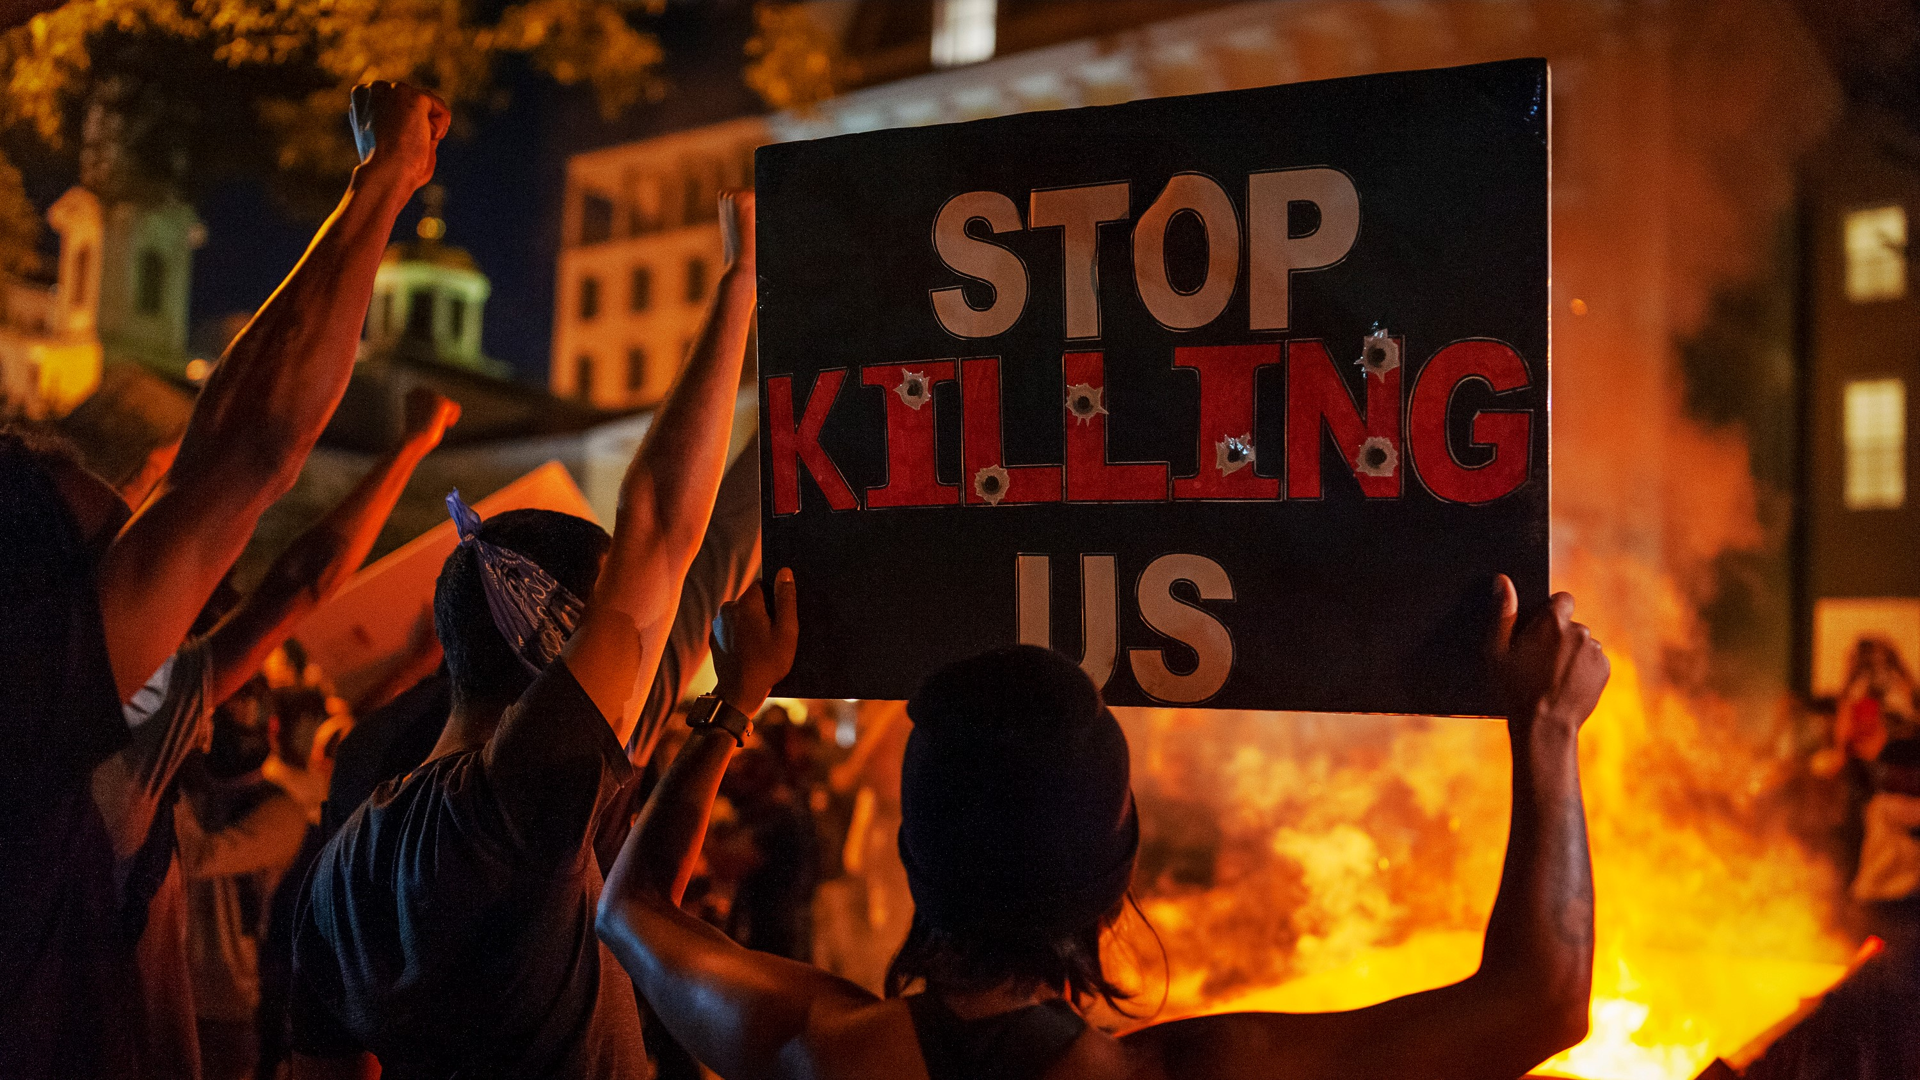 Niels Jespersen: De amerikanske racespændinger kan også ske her, hvis vi ikke passer på